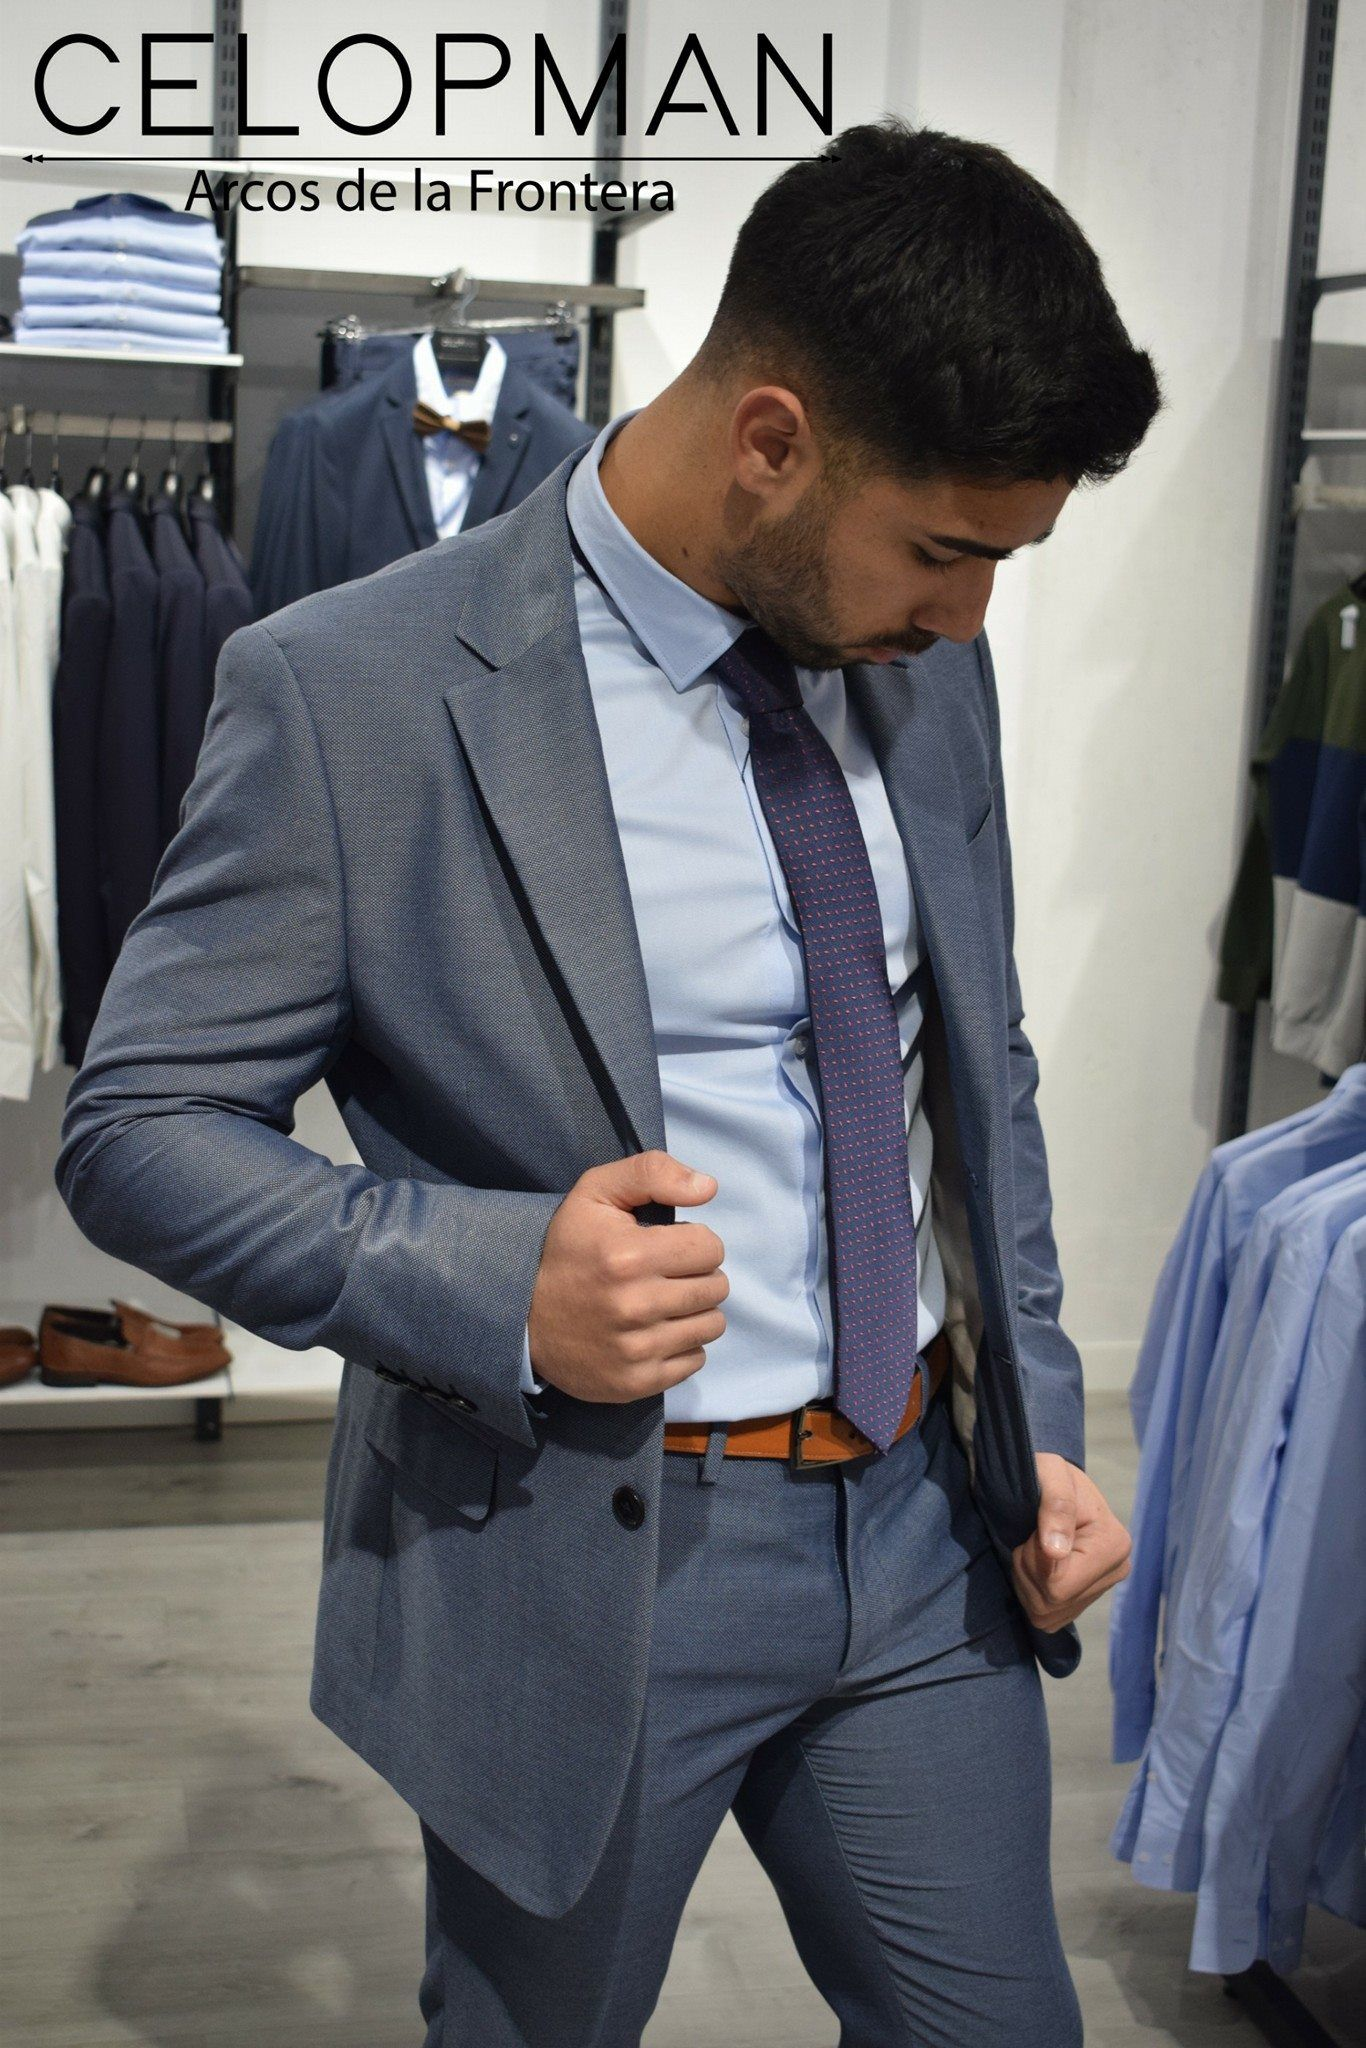 Camisa Gris Arcos Ss18 By Vestir Traje Outfit Celopman Azulado xqwp4q0 2056f411945